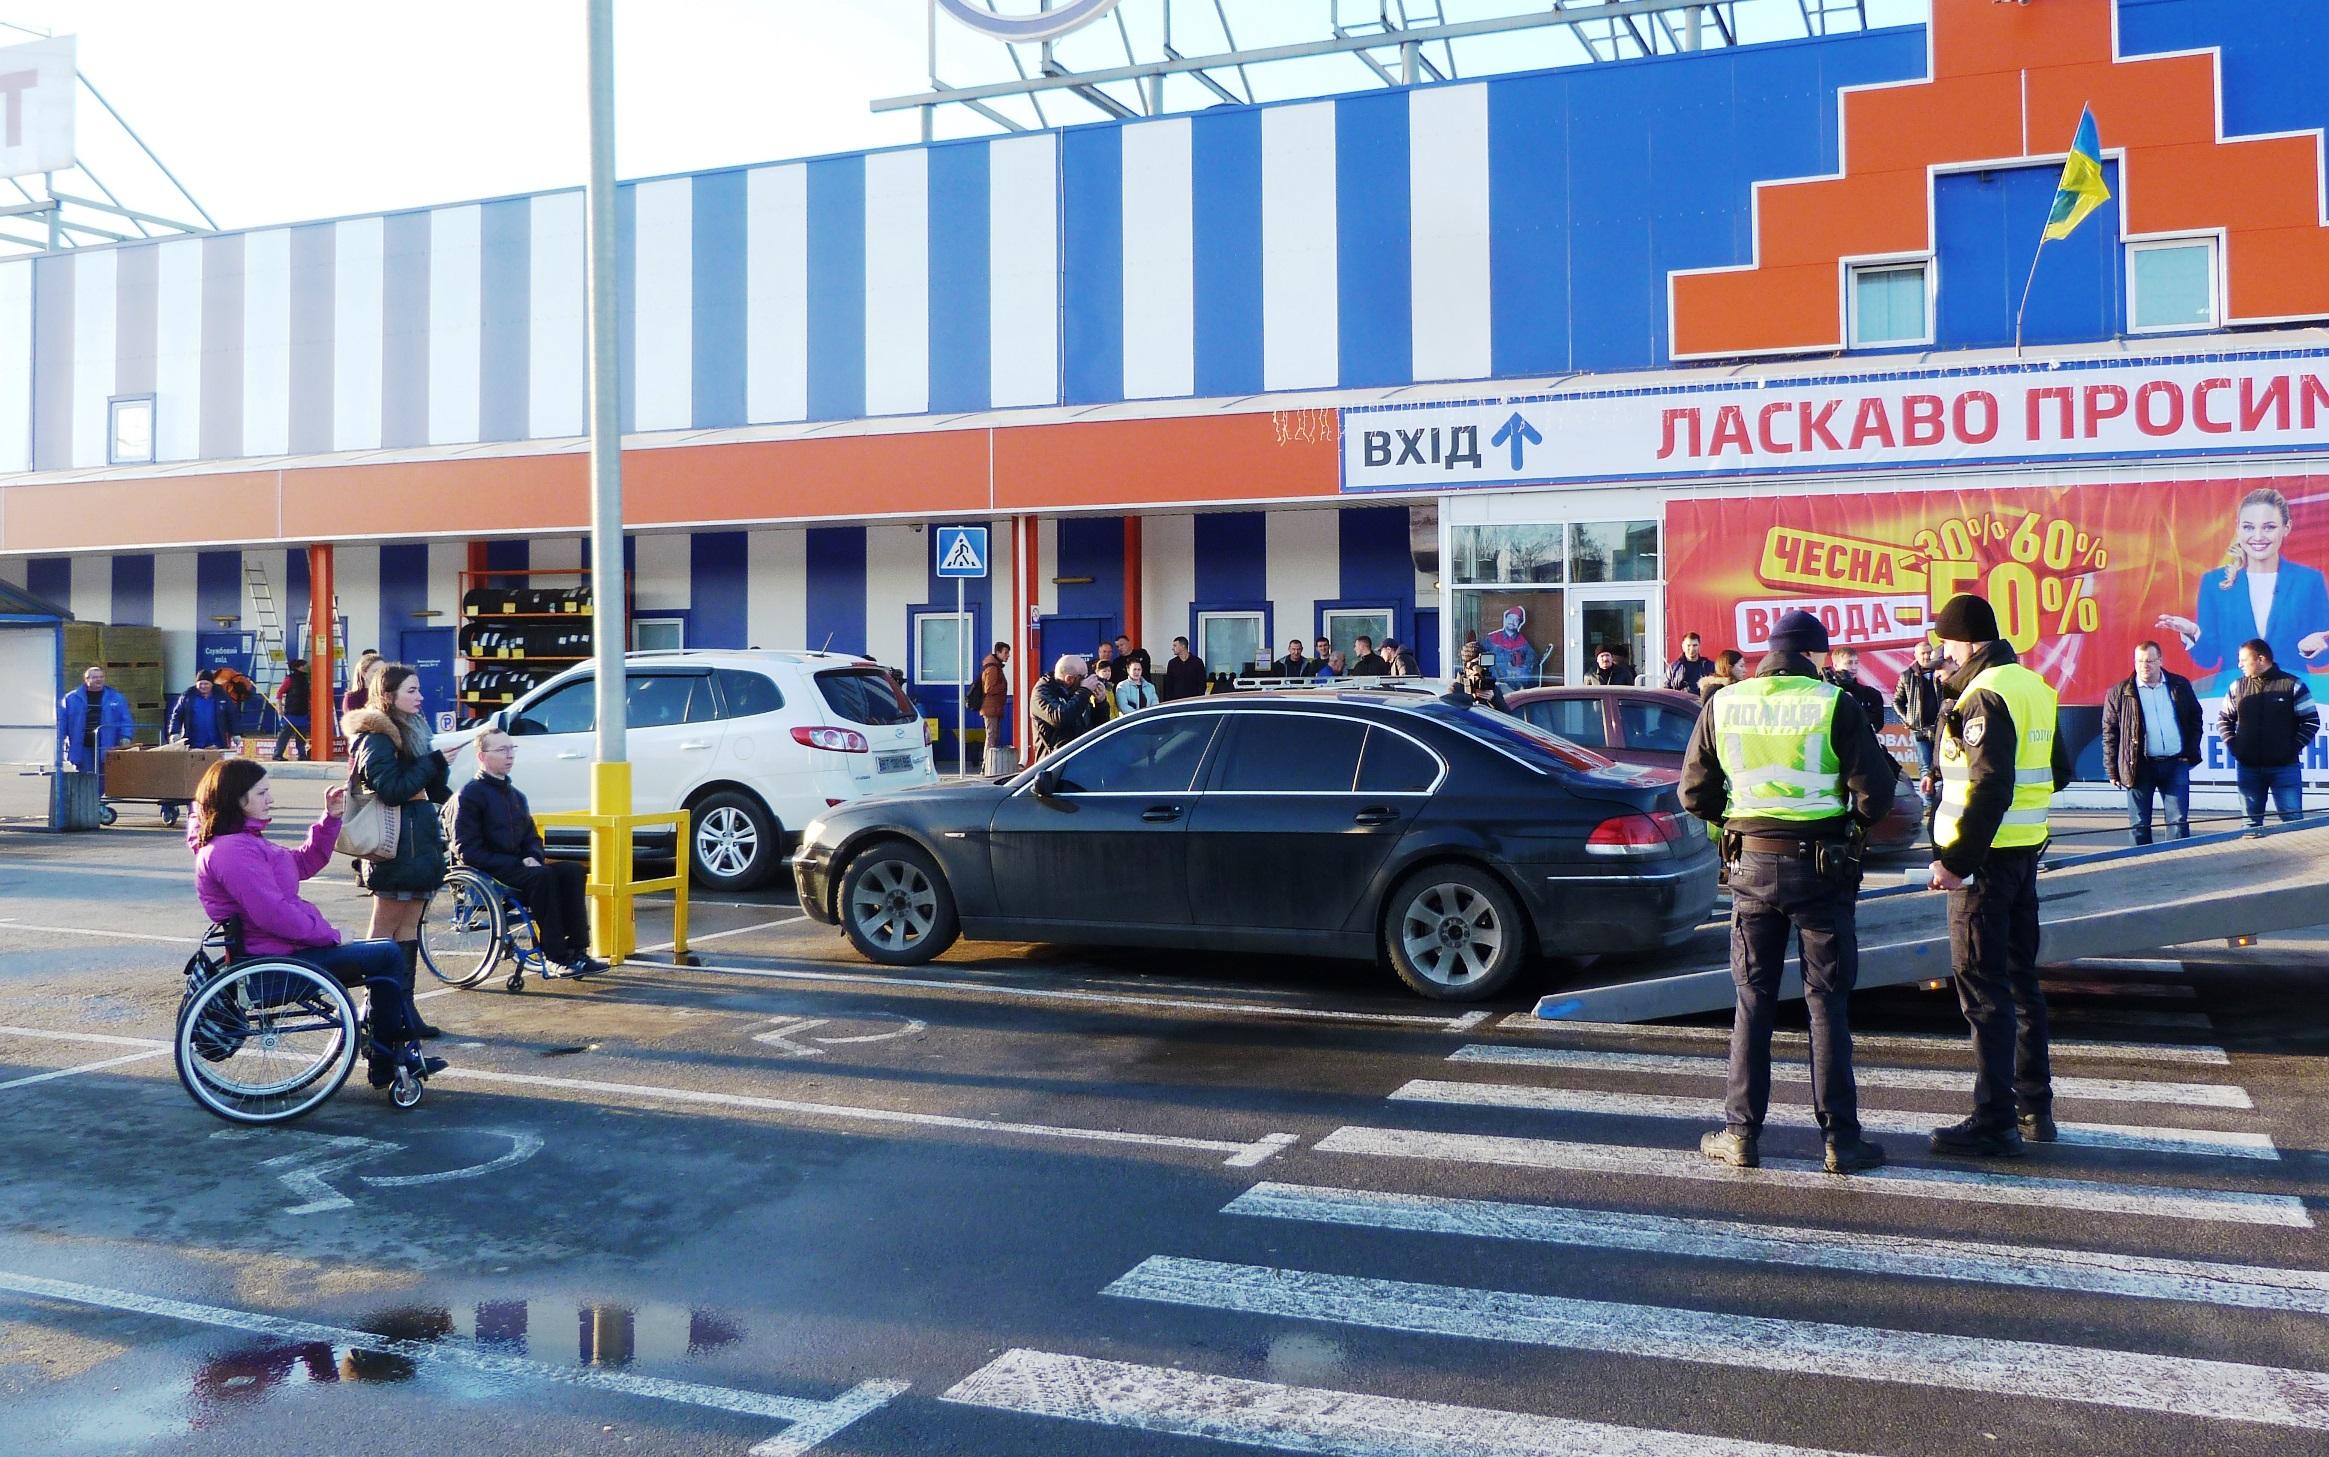 Авто отправили на штрафплощадку за неправильную парковку возле херсонского ТРЦ (фотофакт)